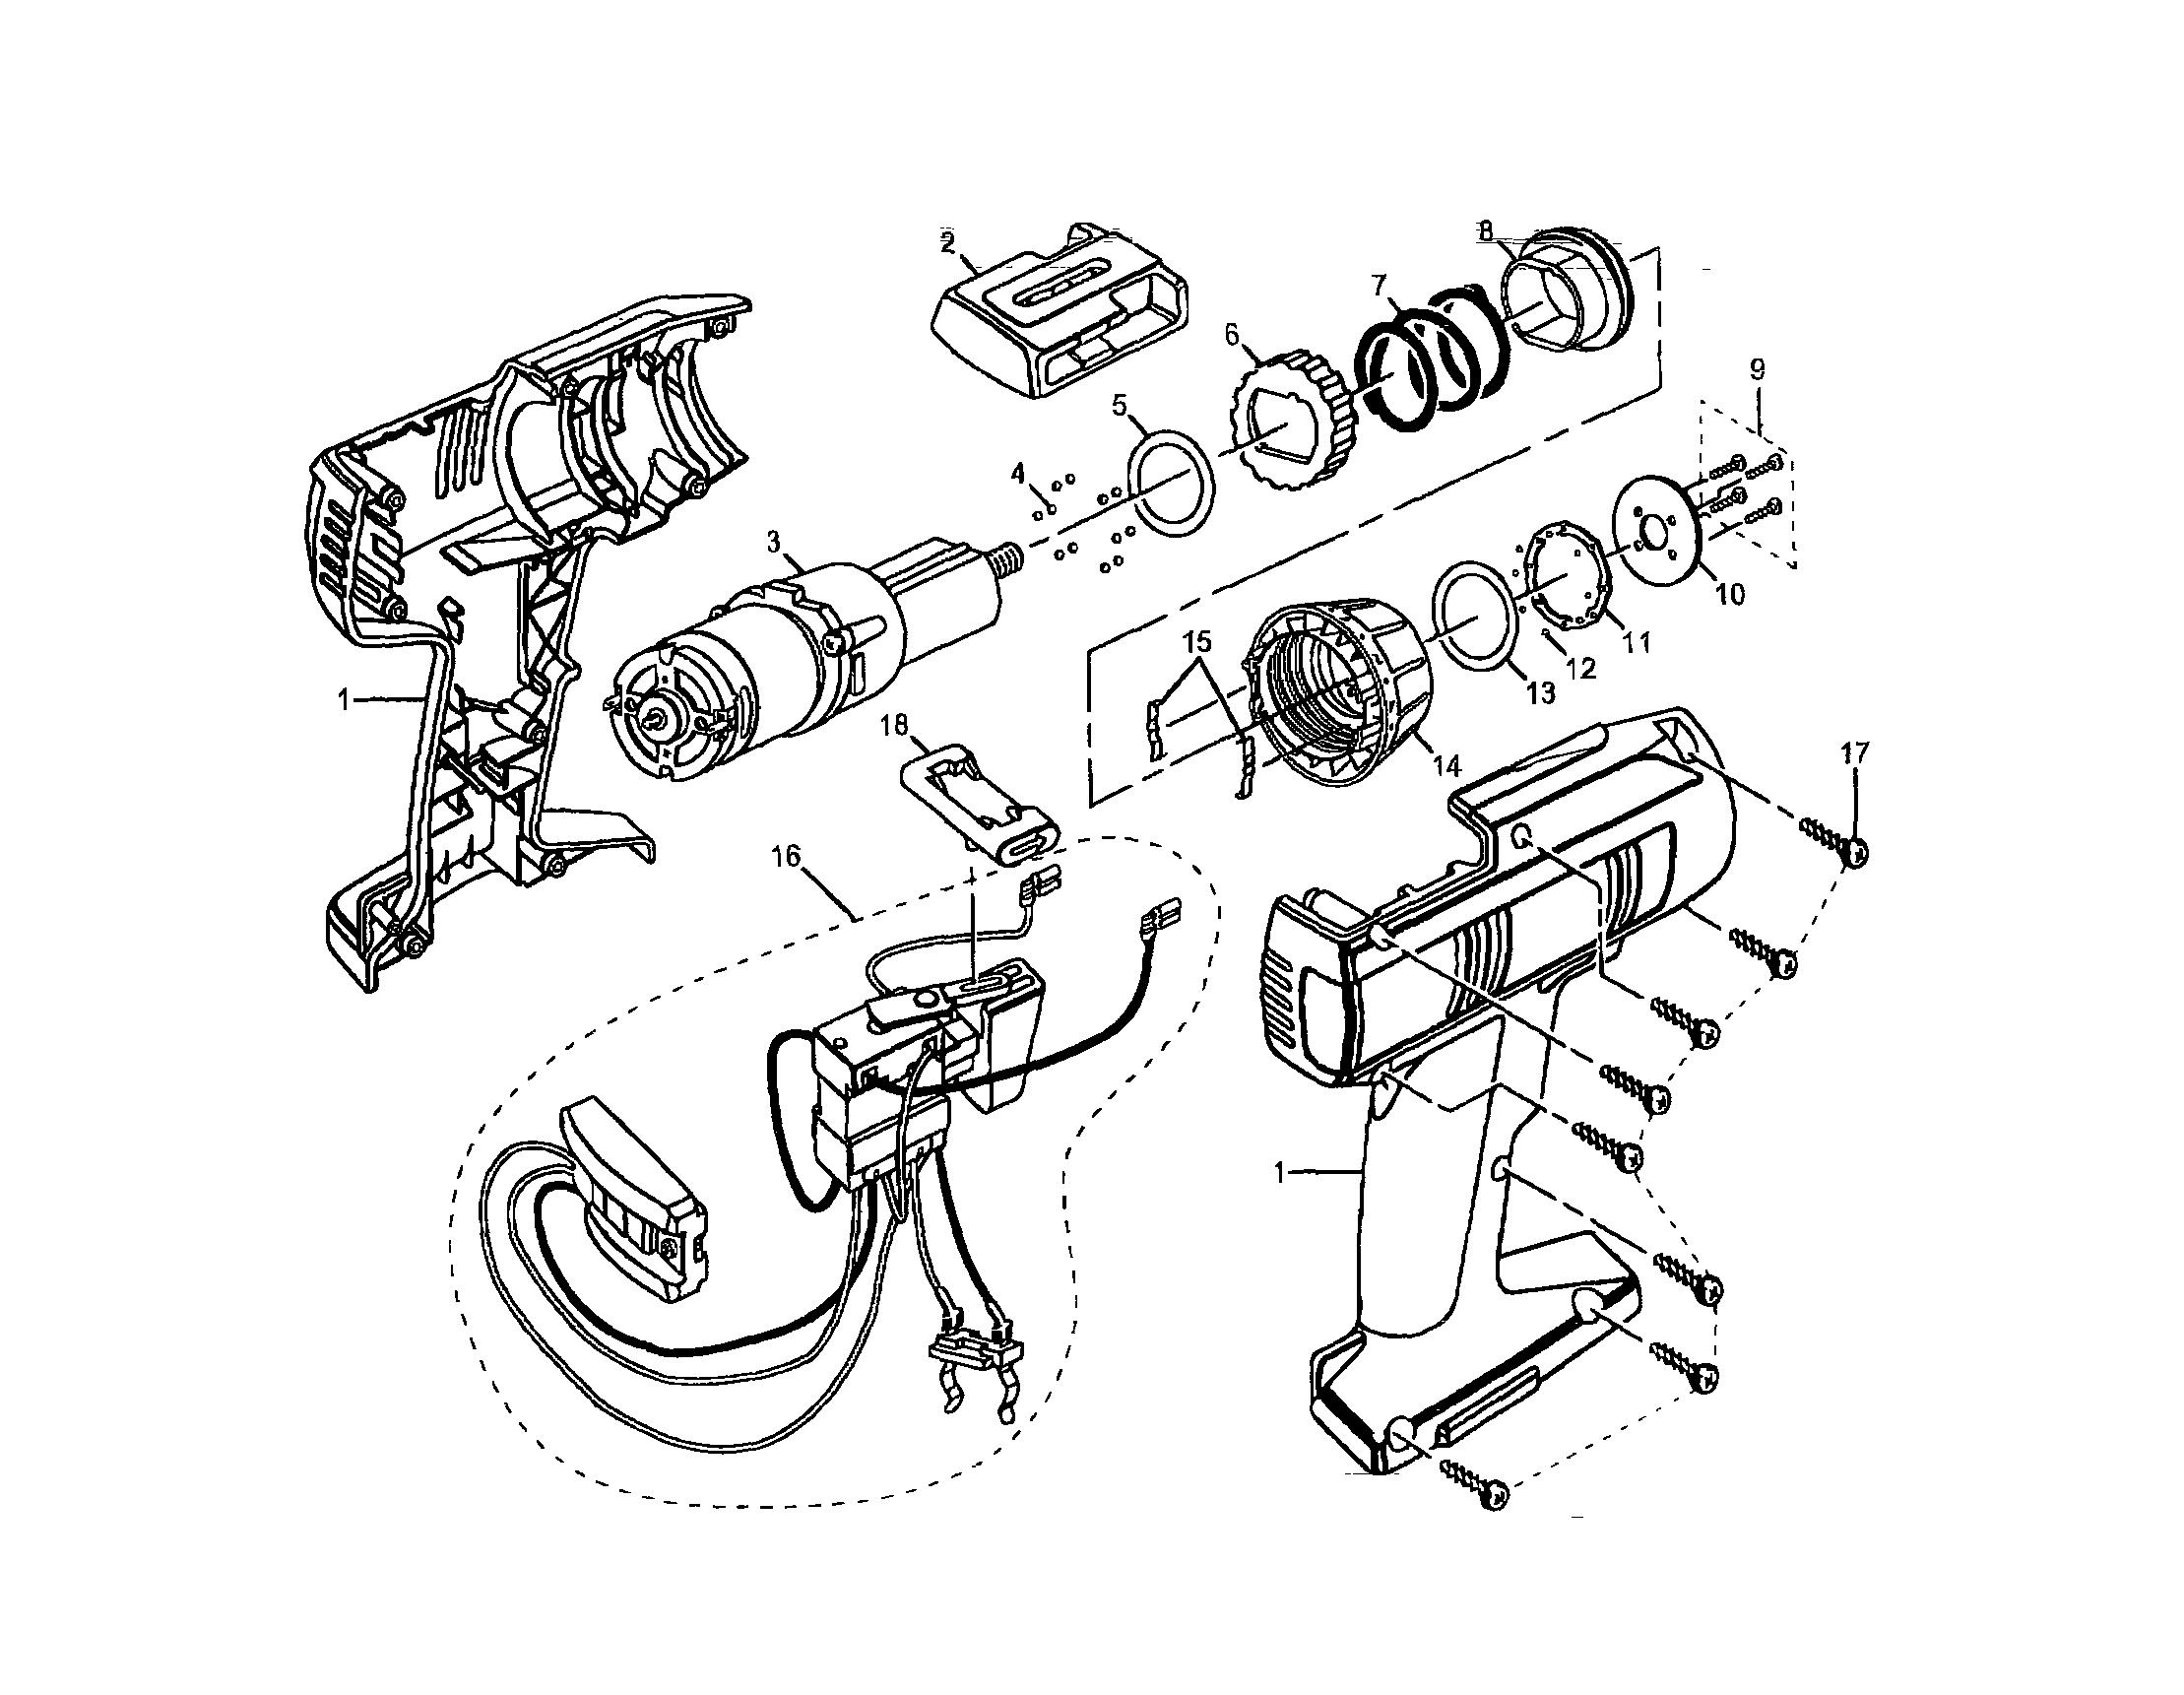 Craftsman 14 4 volt cordless drill driver parts model 973114240 rh searspartsdirect